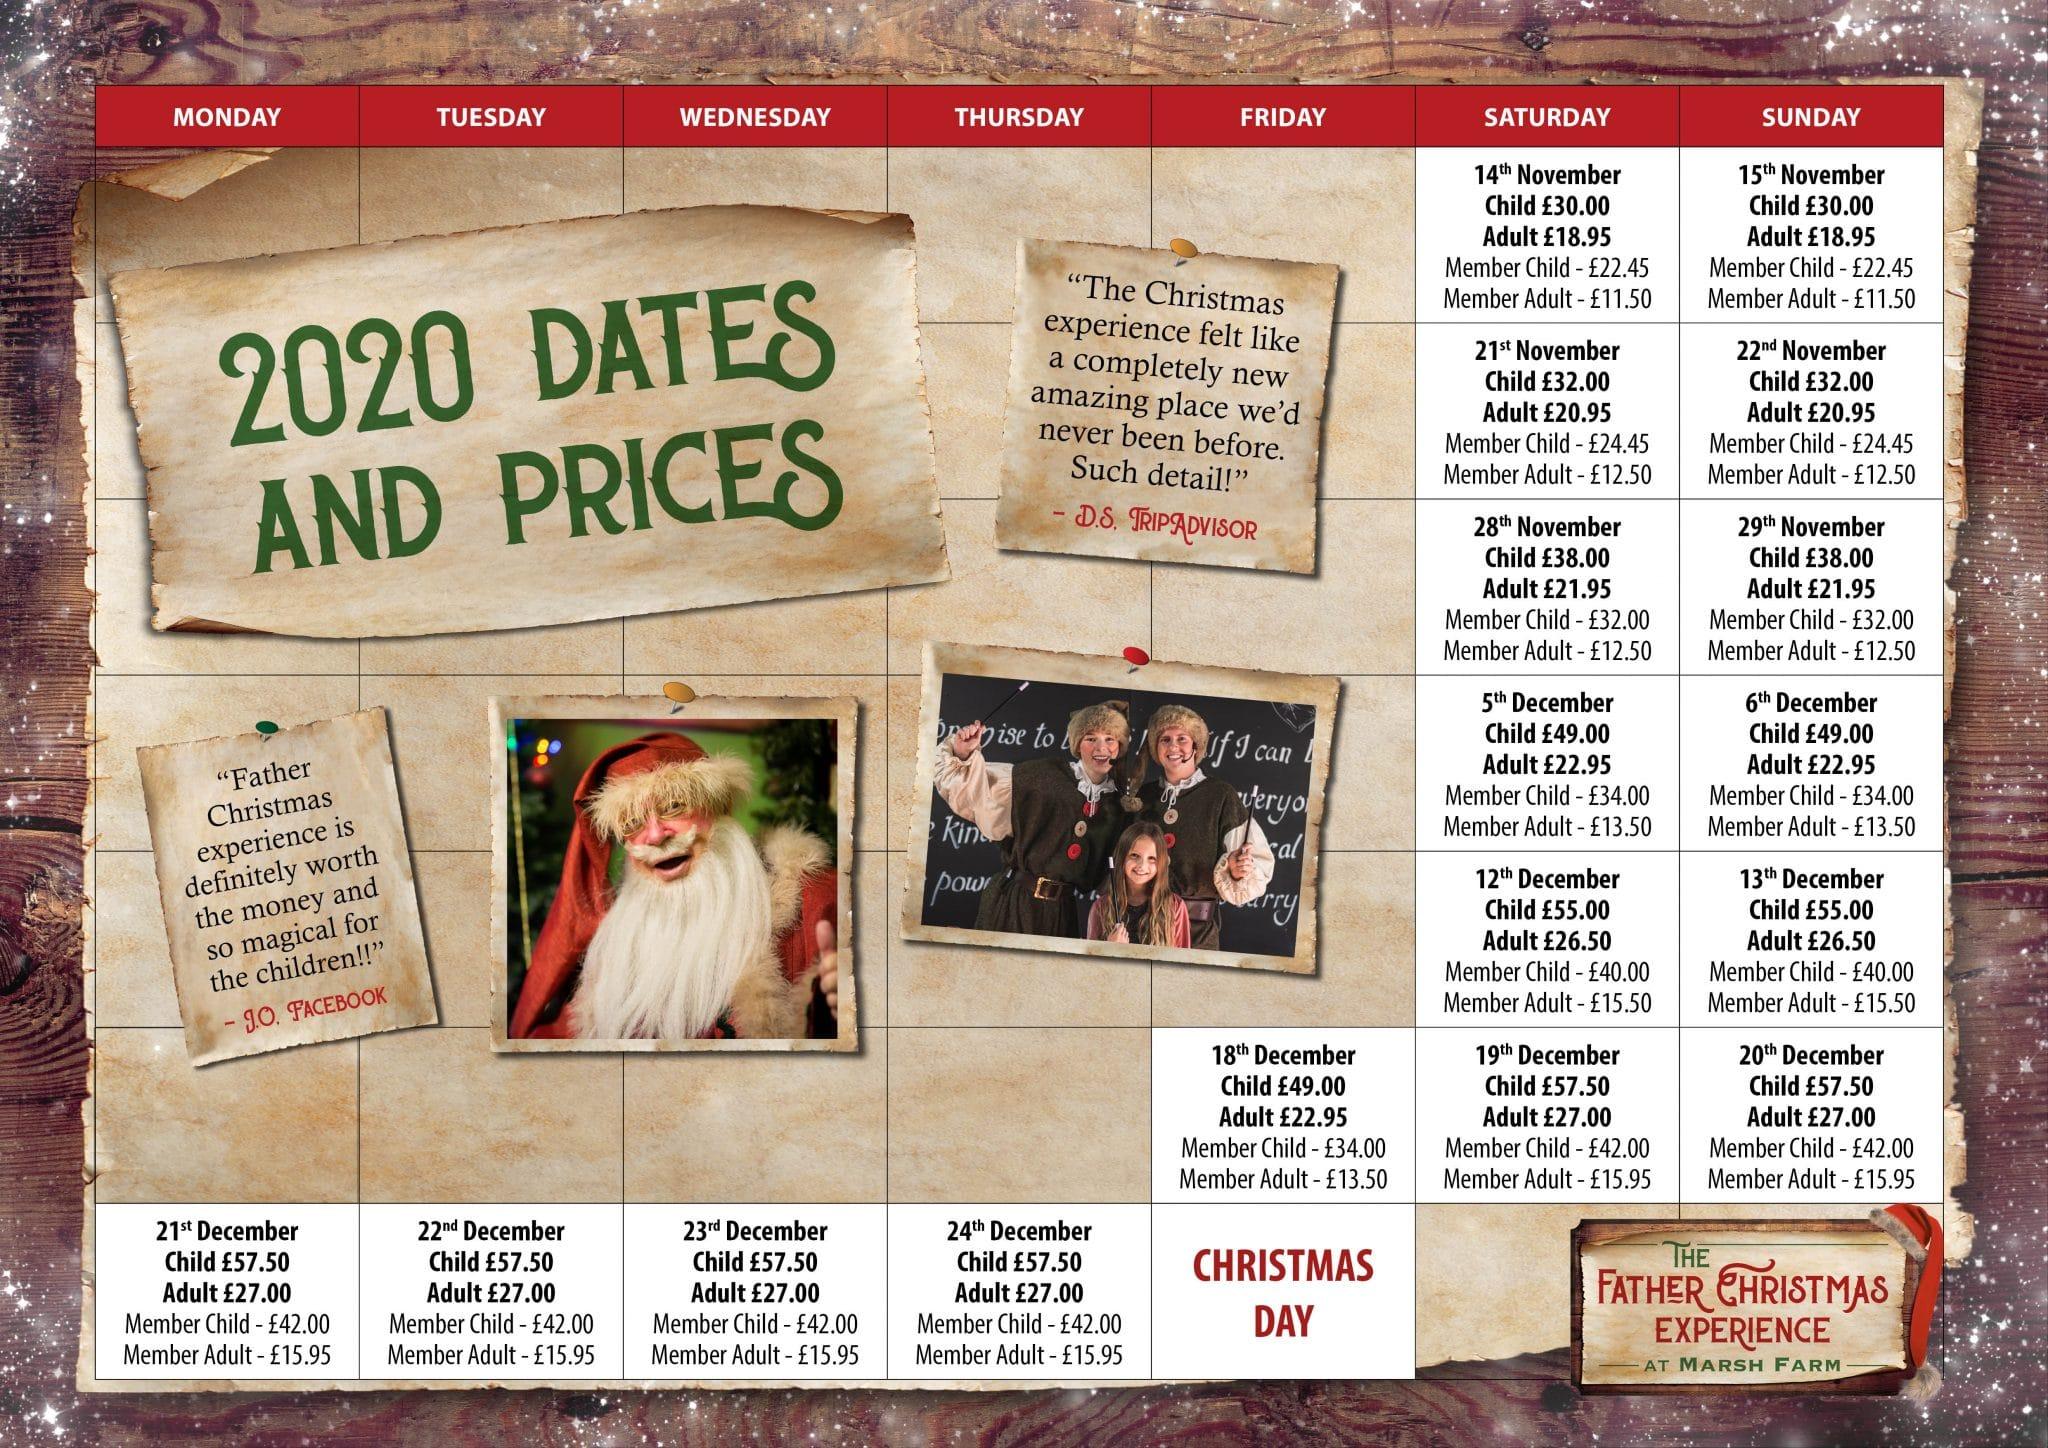 2020 calendar of prices